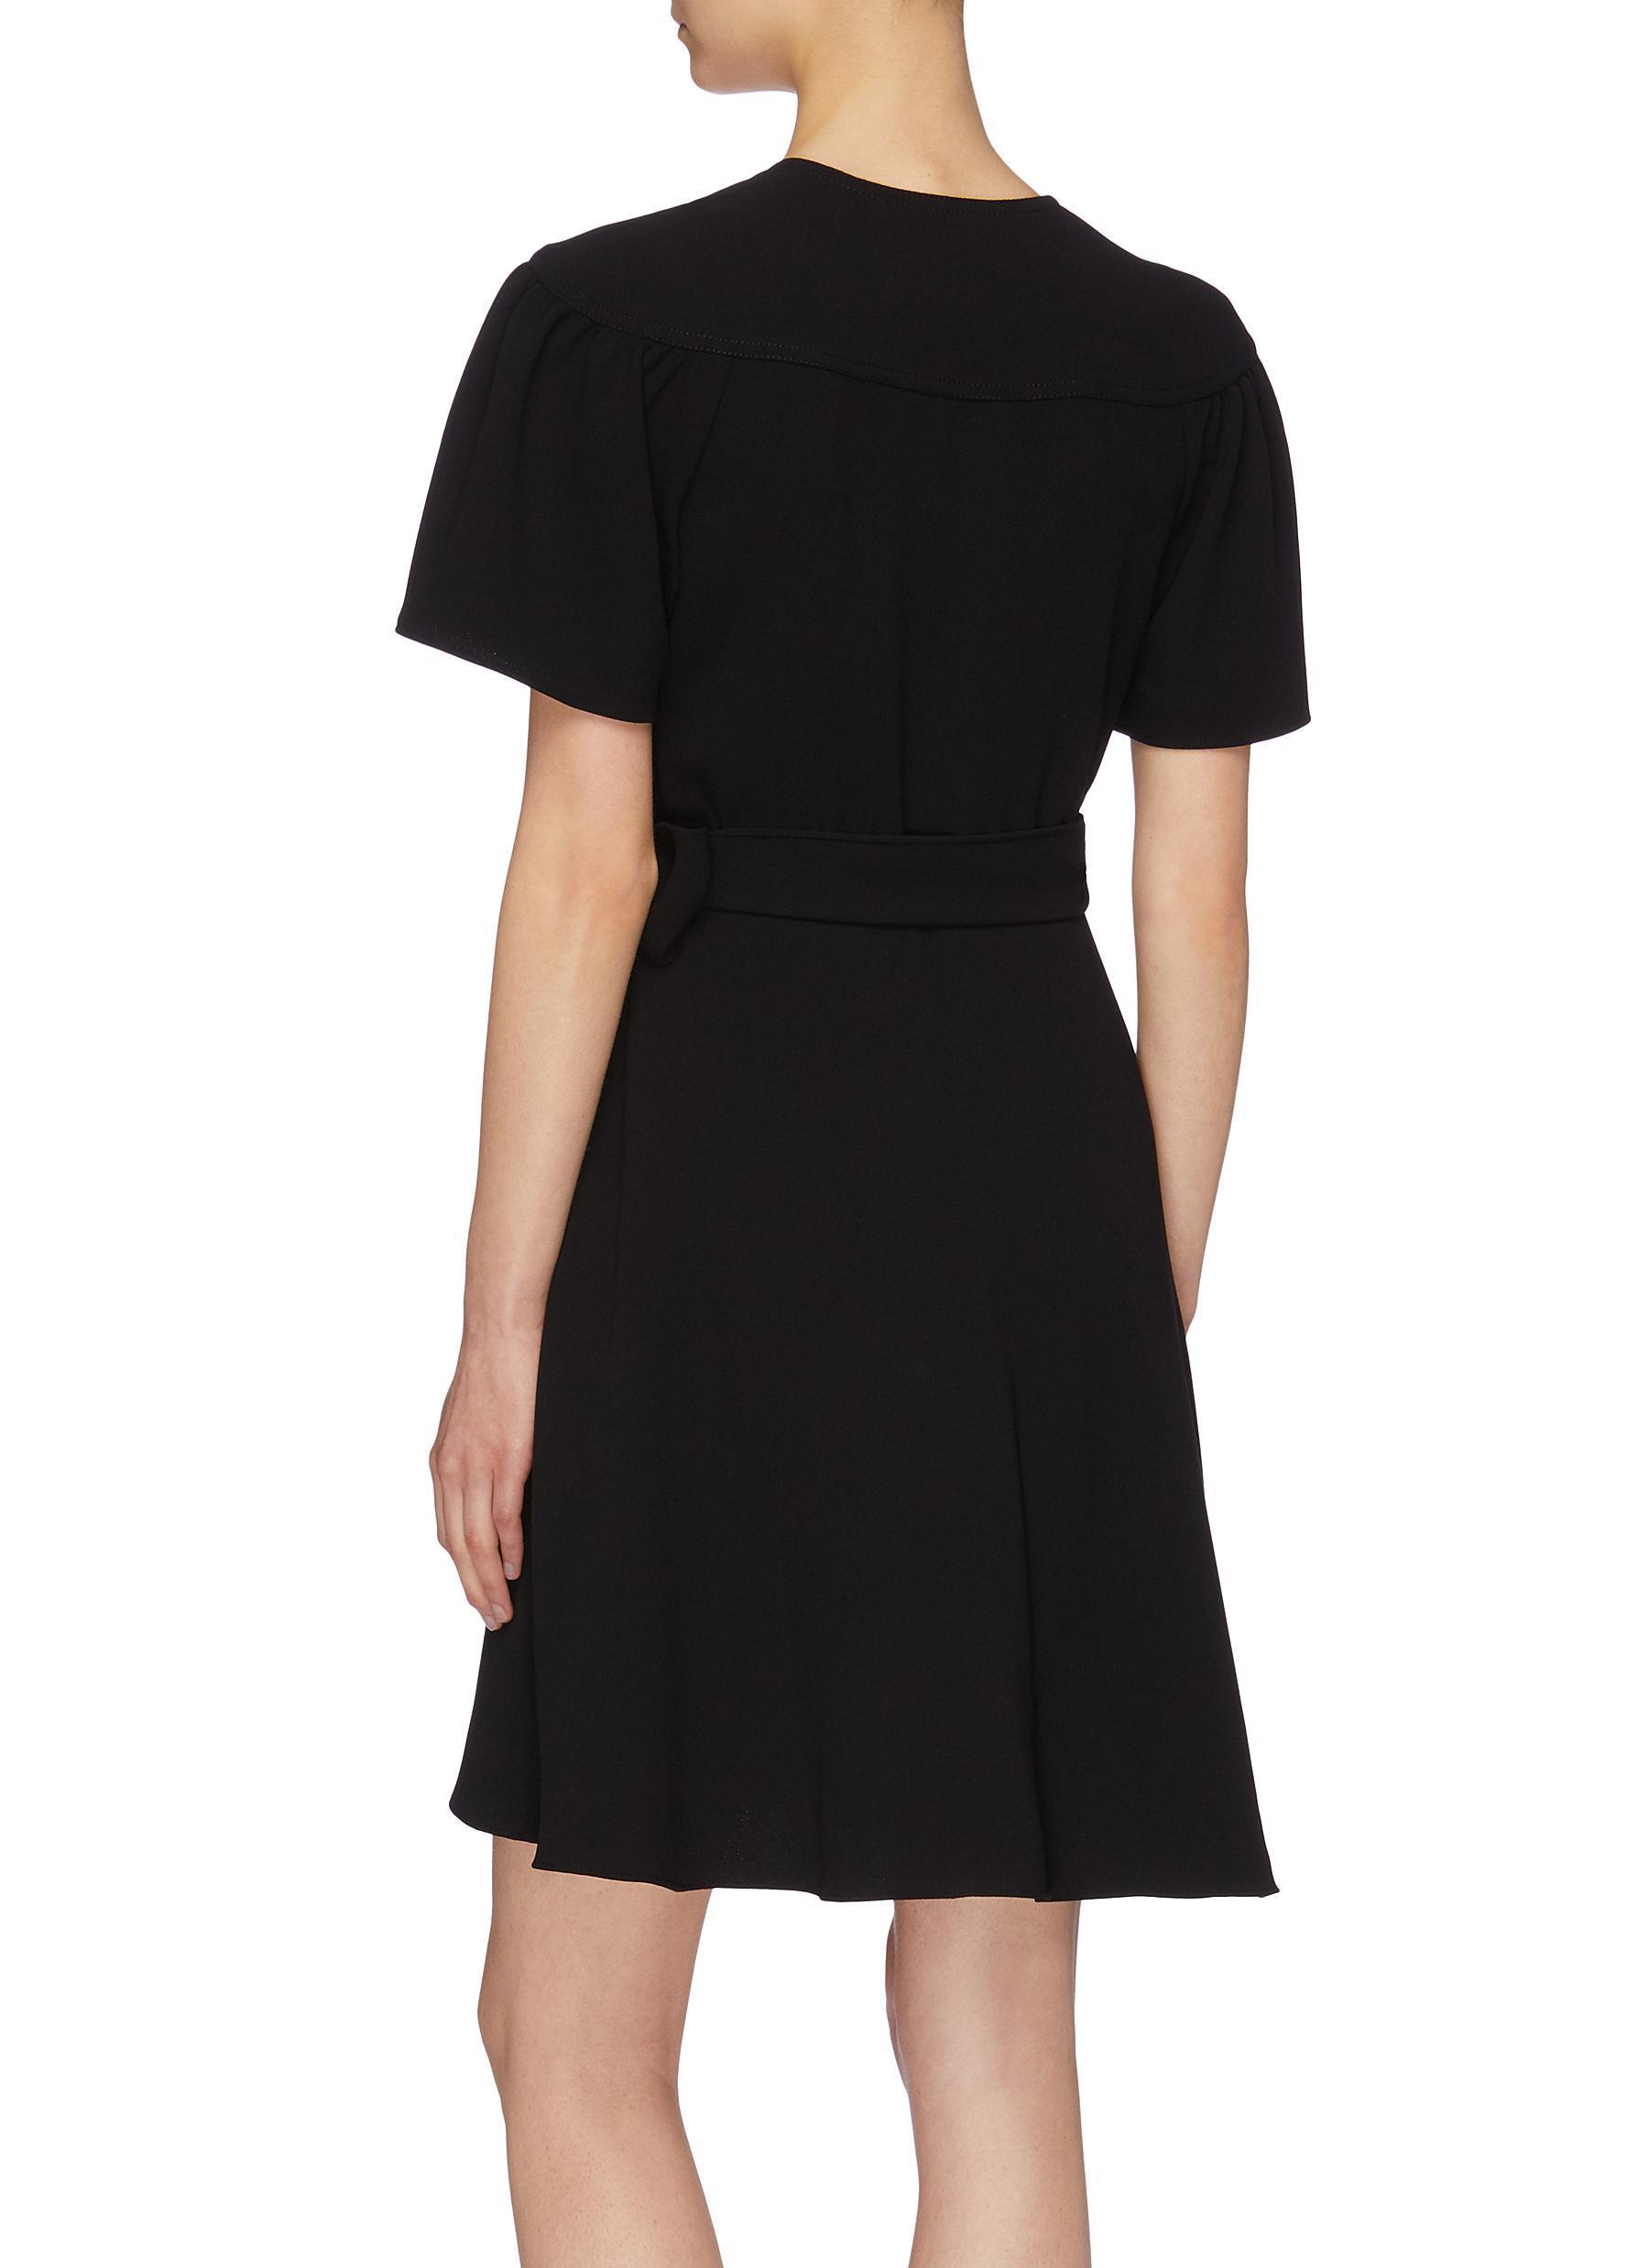 3eb1806b0b Diane von Furstenberg - Black  zella  Mini Wrap Dress - Lyst. View  fullscreen